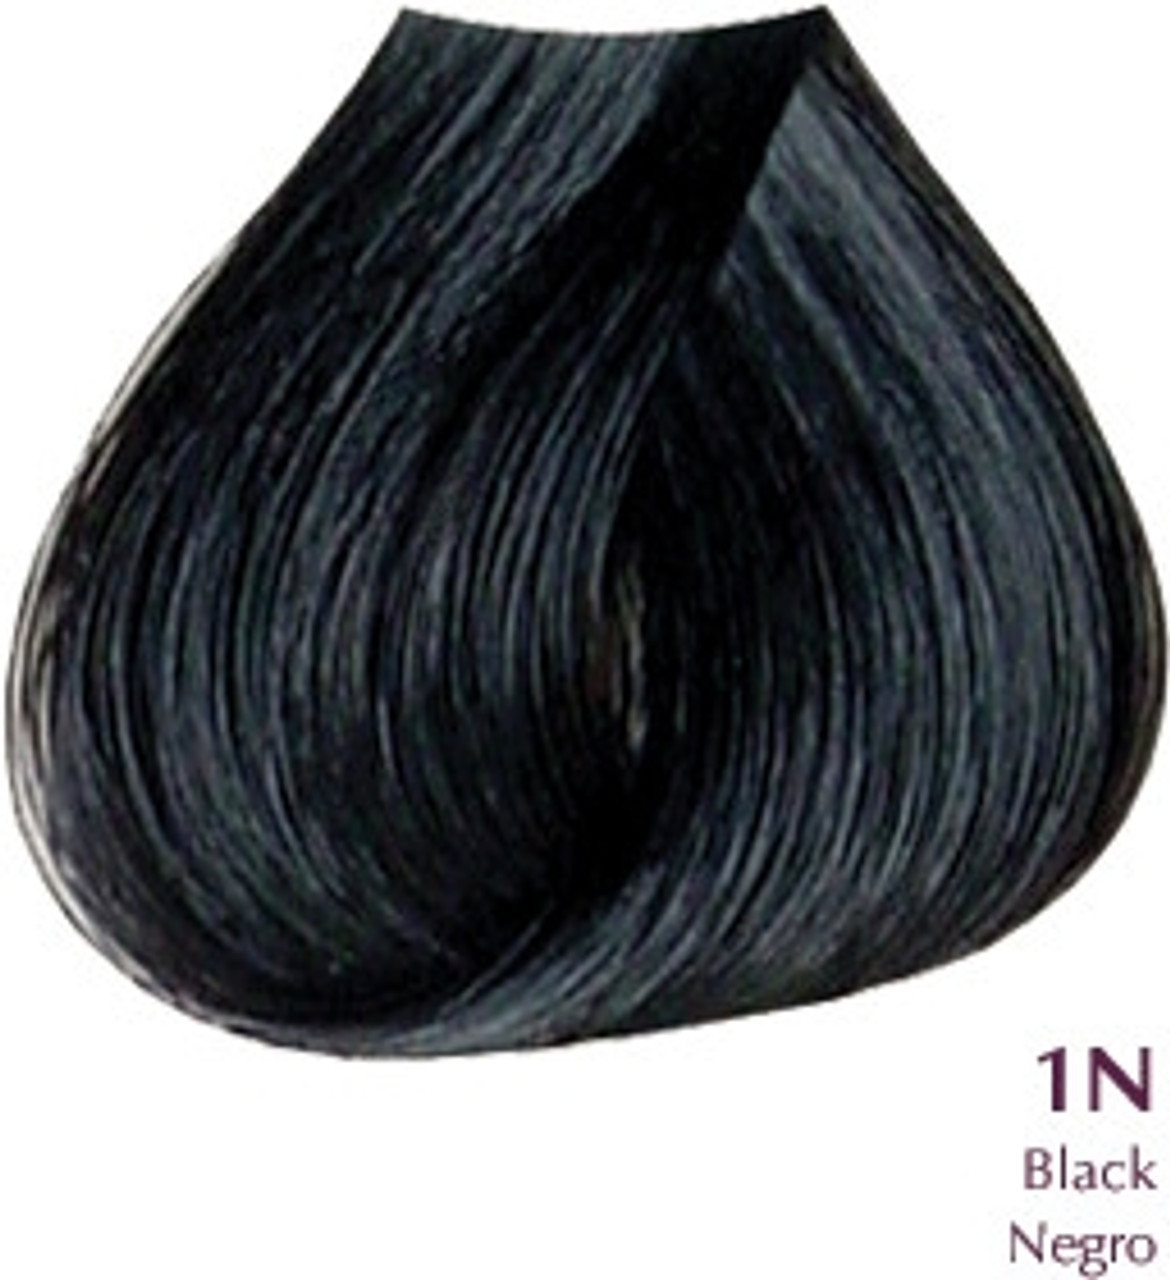 Satin Hair Color - Naturals - 1N Black